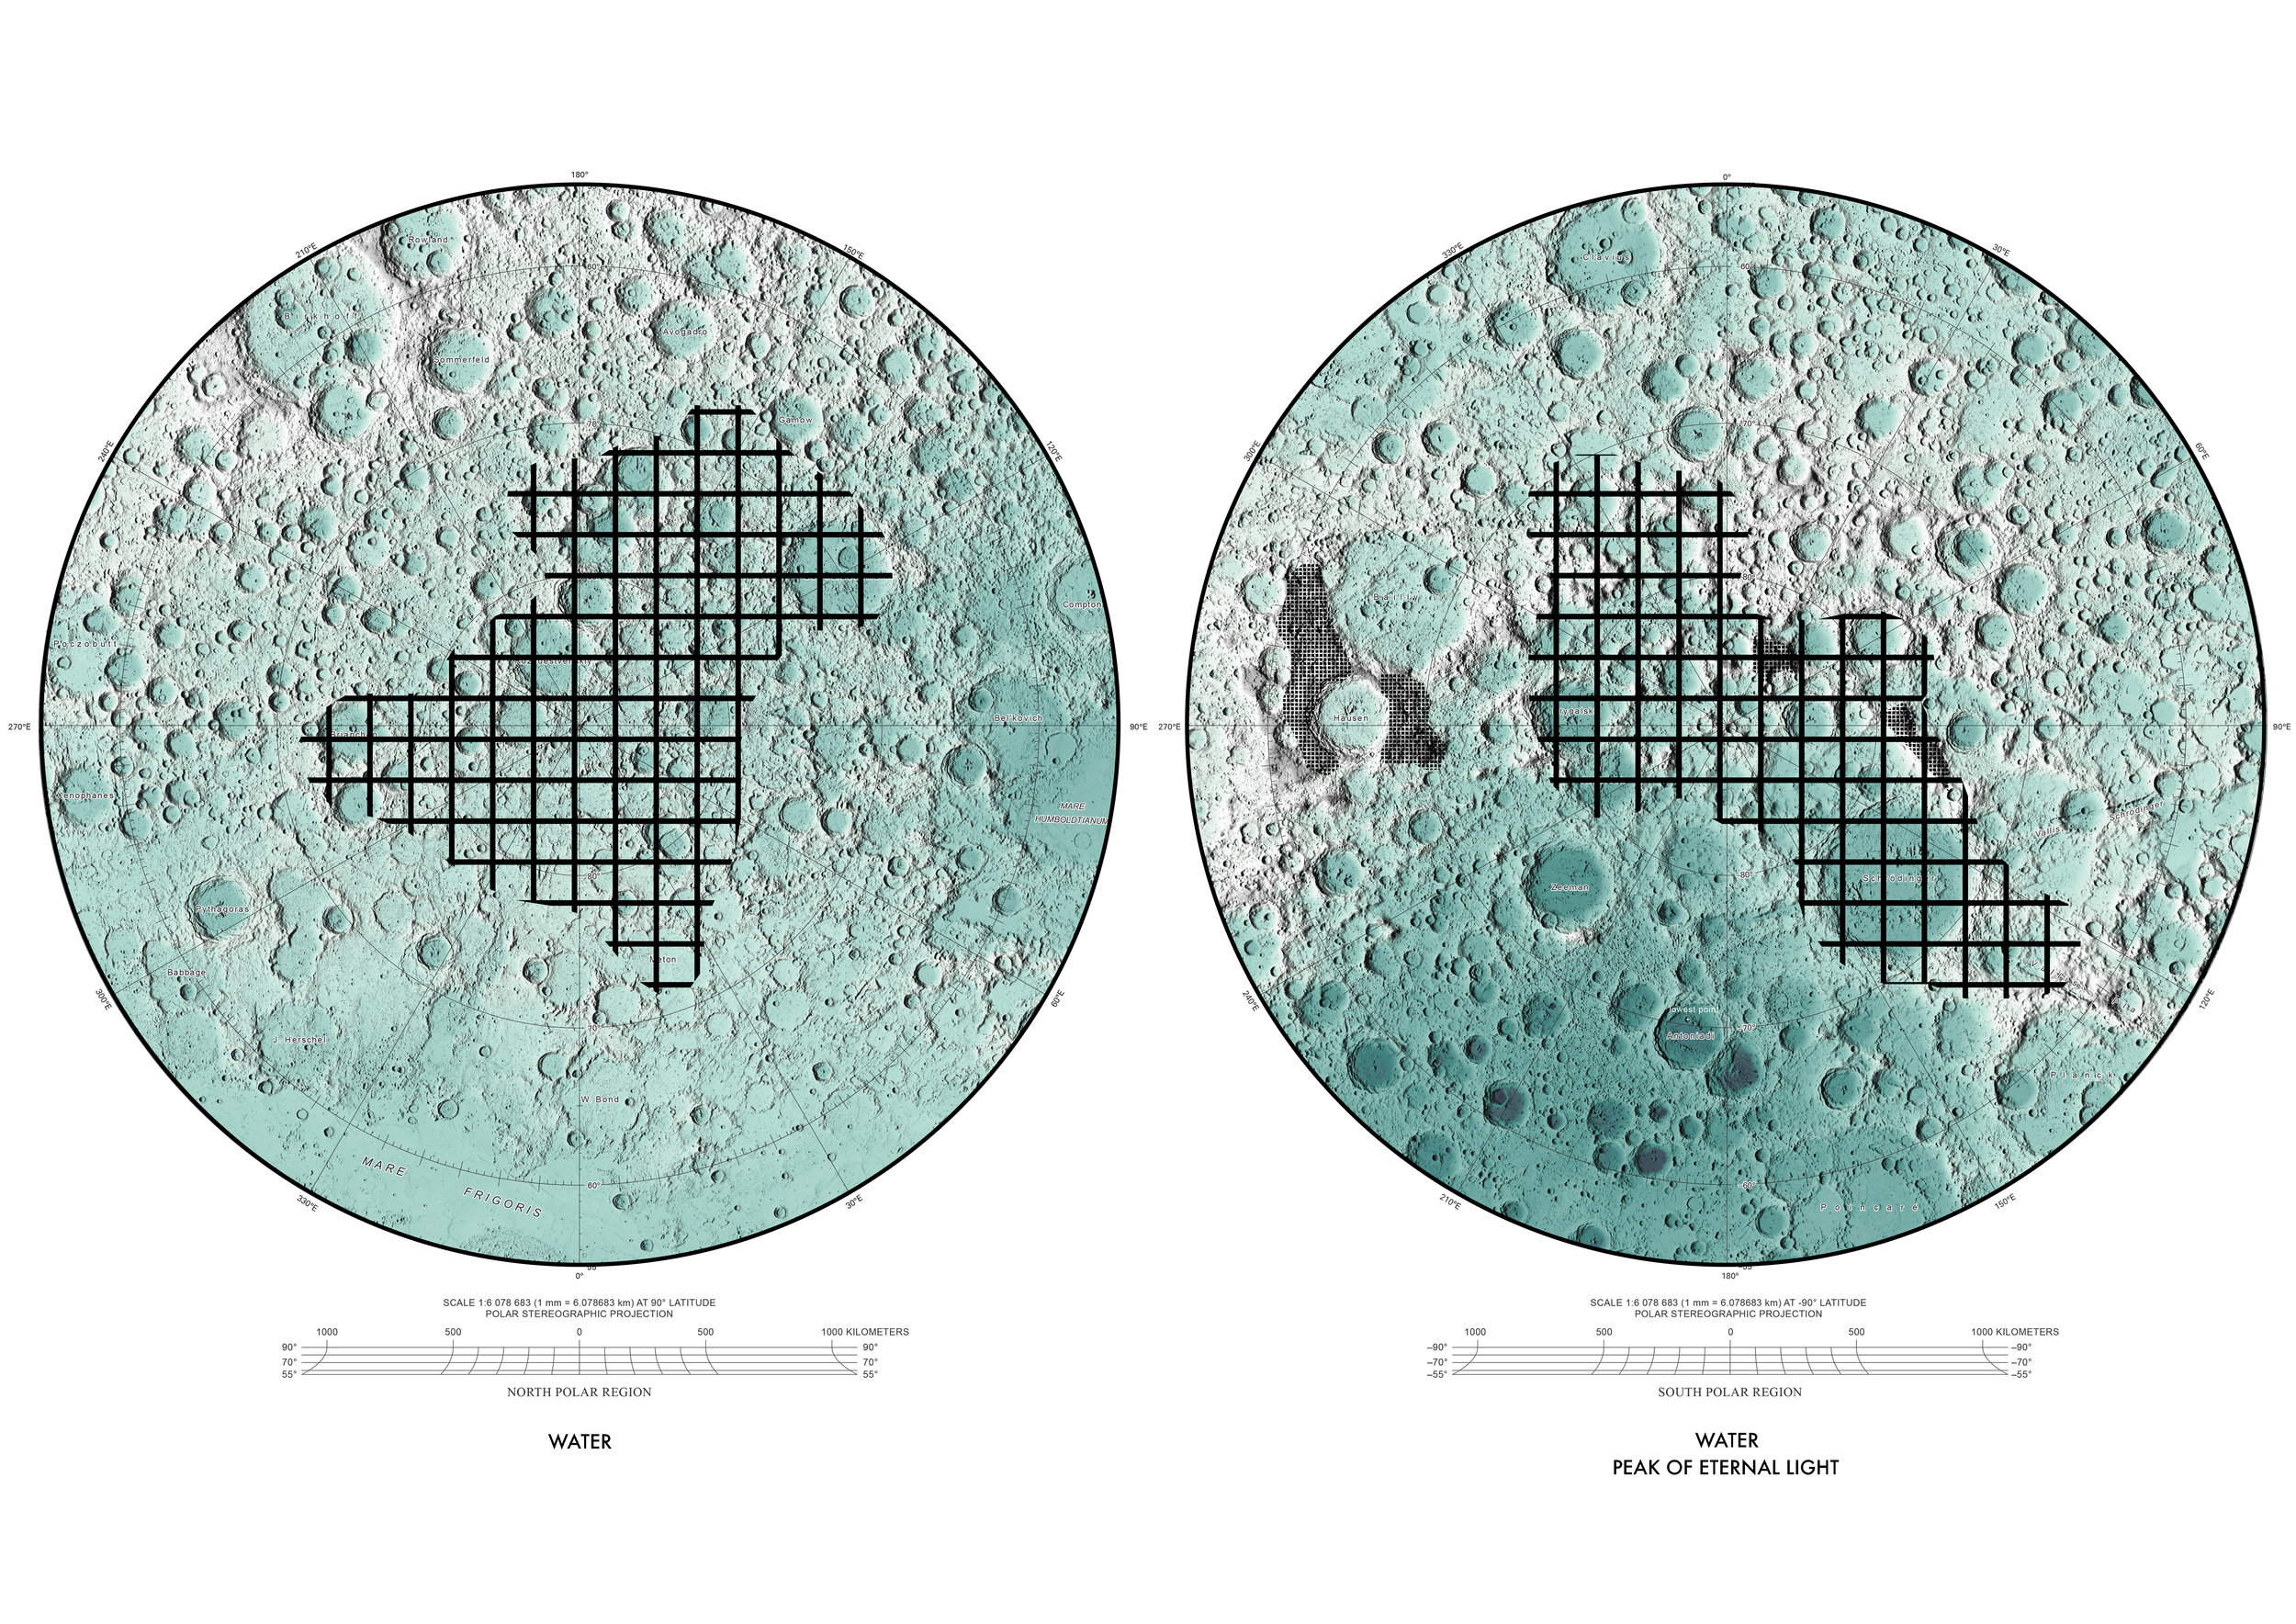 A2 - hendriksen moon water.jpg